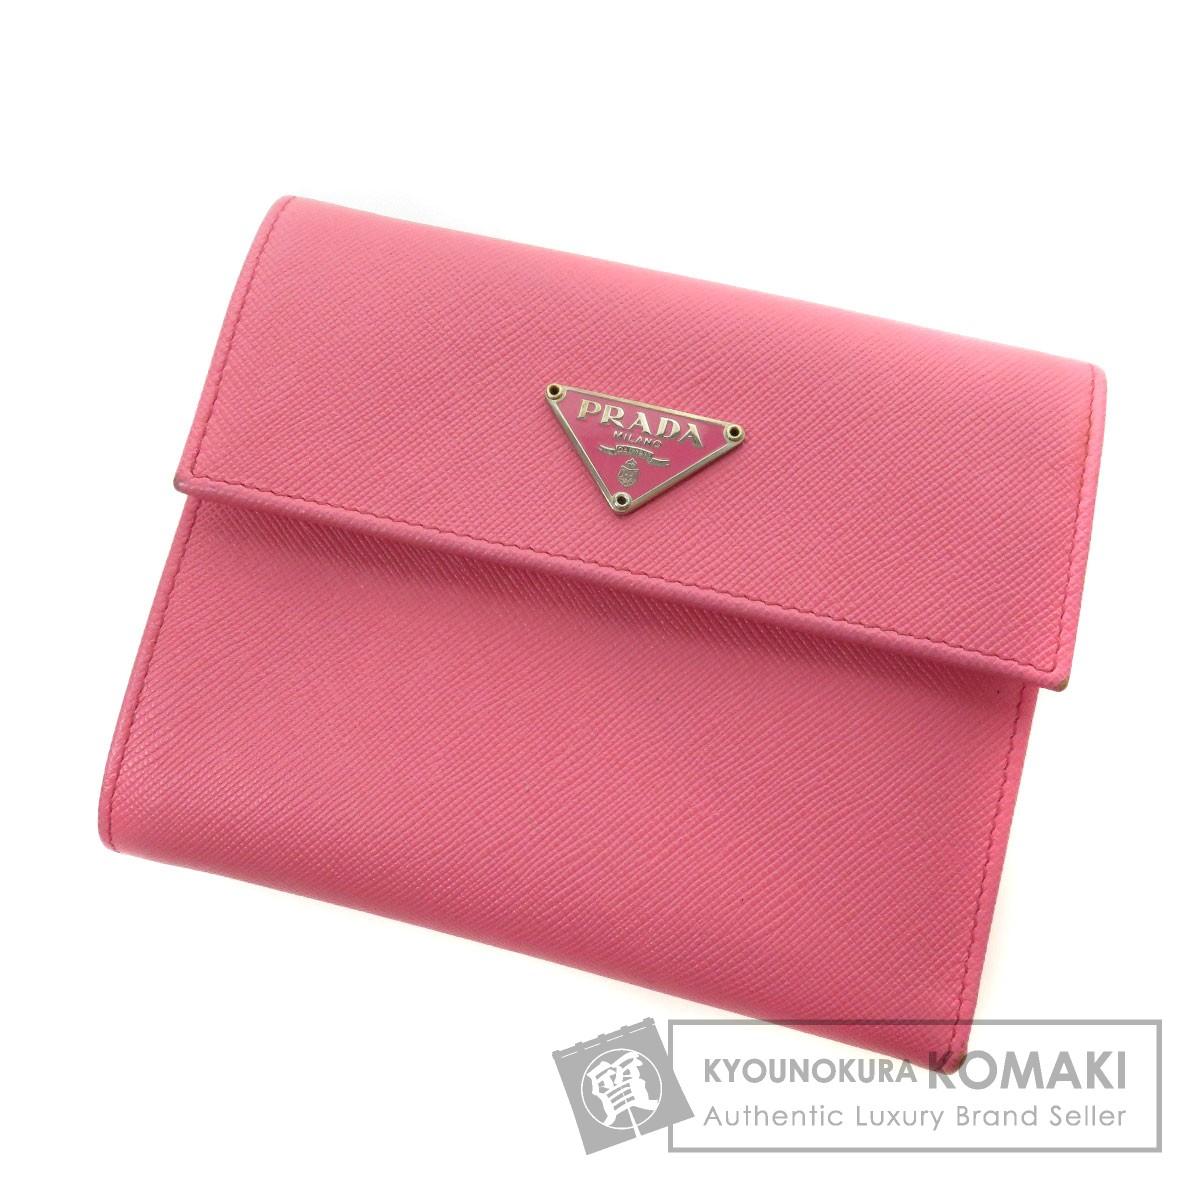 PRADA サフィアーノ 二つ折り財布(小銭入れあり) レザー レディース 【中古】【プラダ】